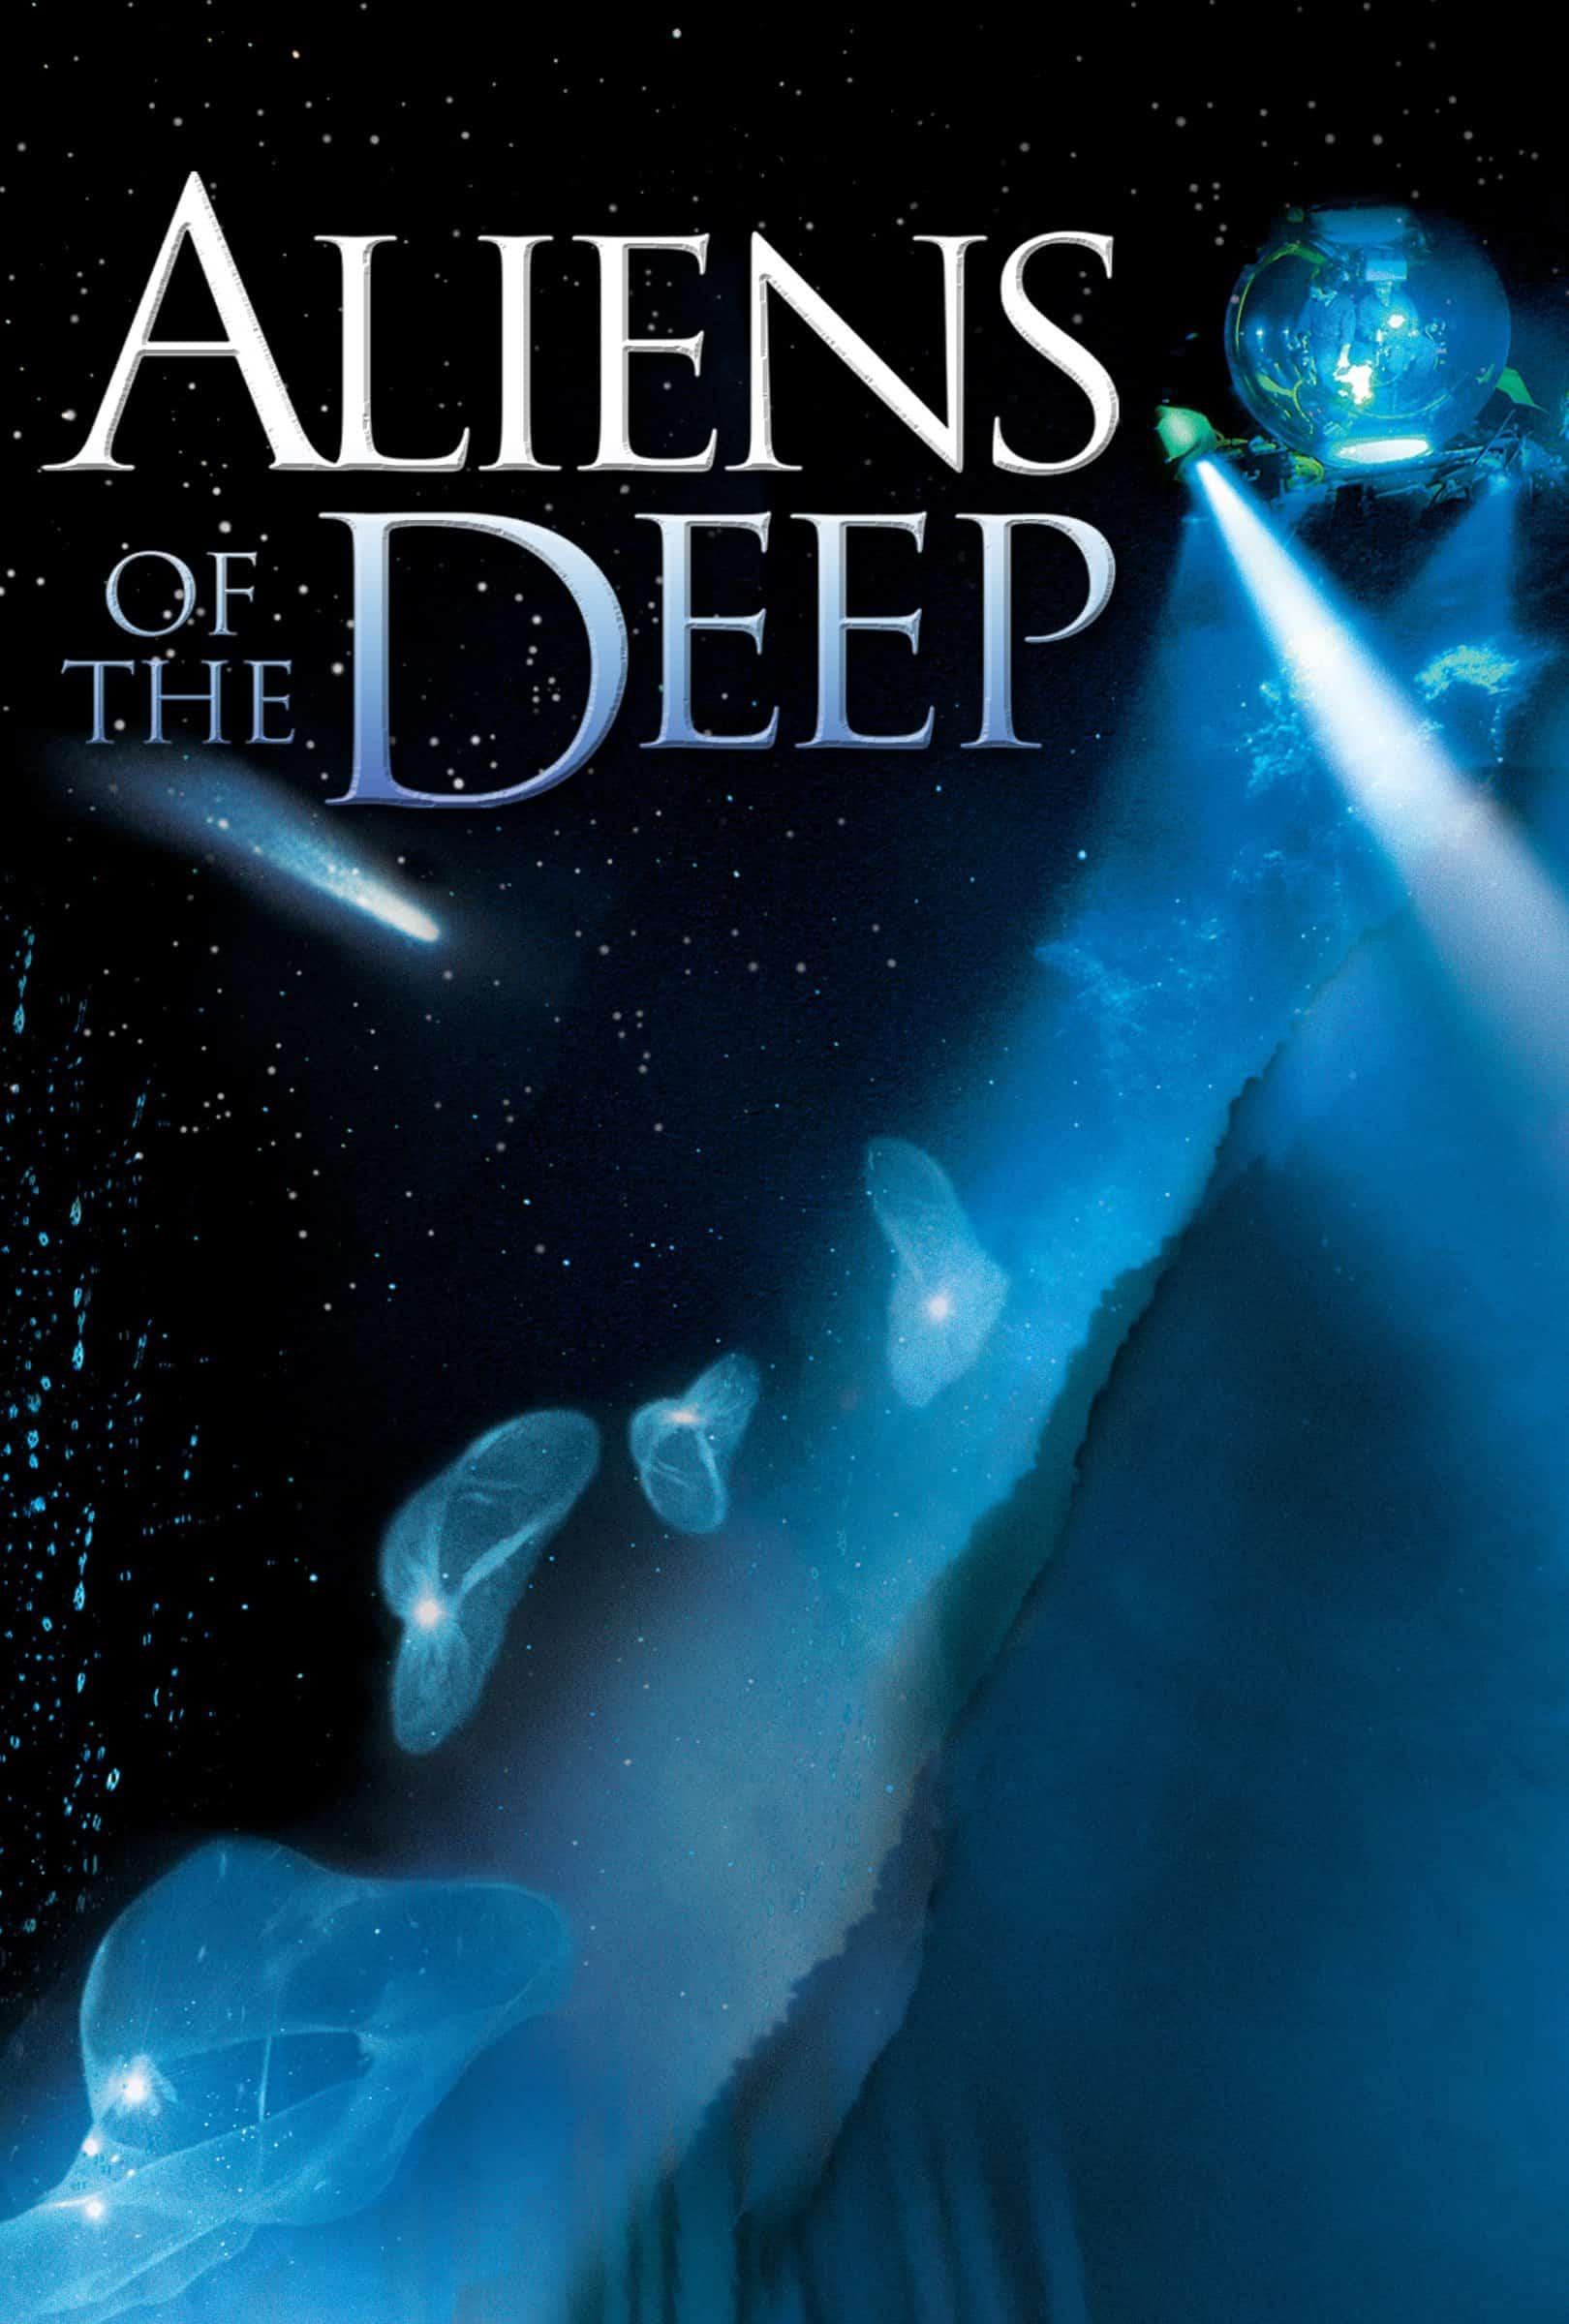 Aliens of the Deep, 2005